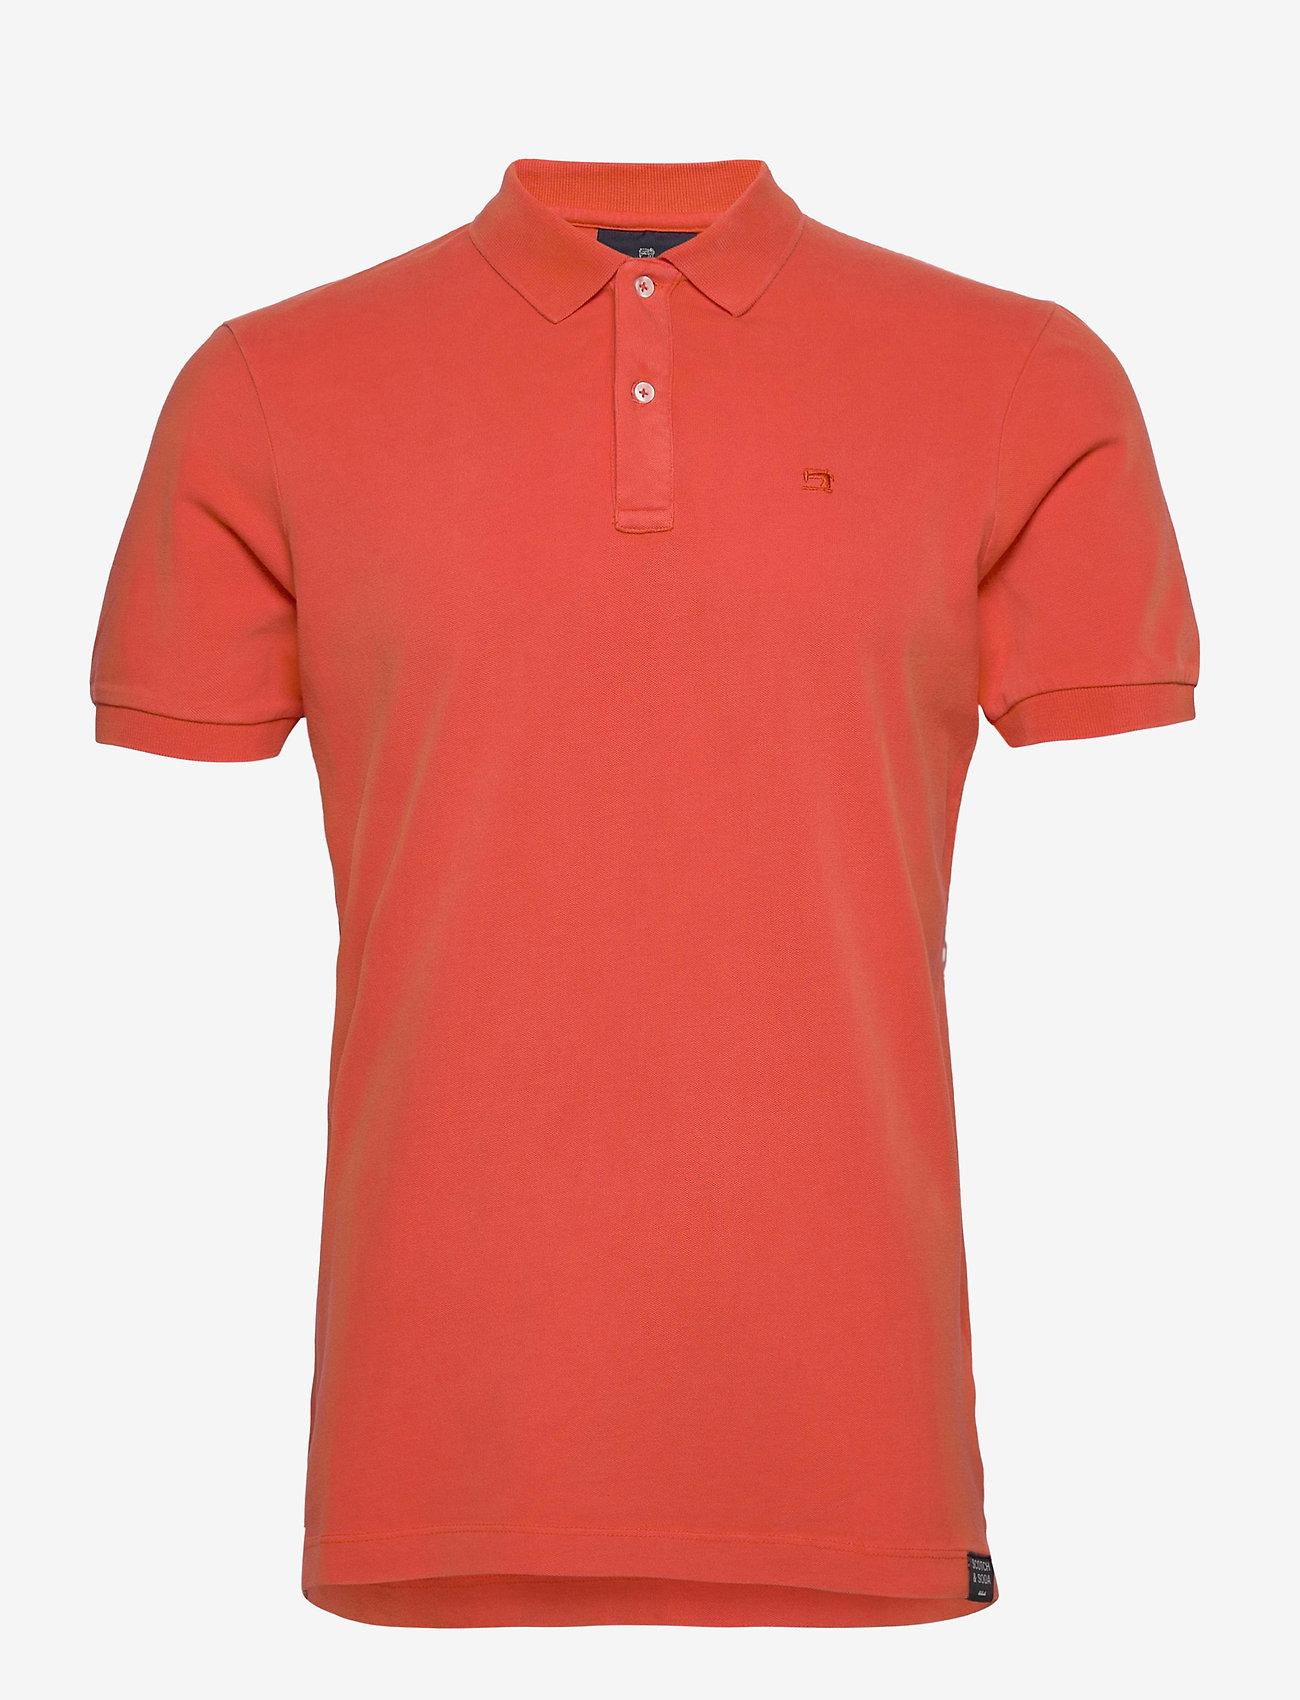 Scotch & Soda - Garment dyed stretch polo - short-sleeved polos - orange shell - 0